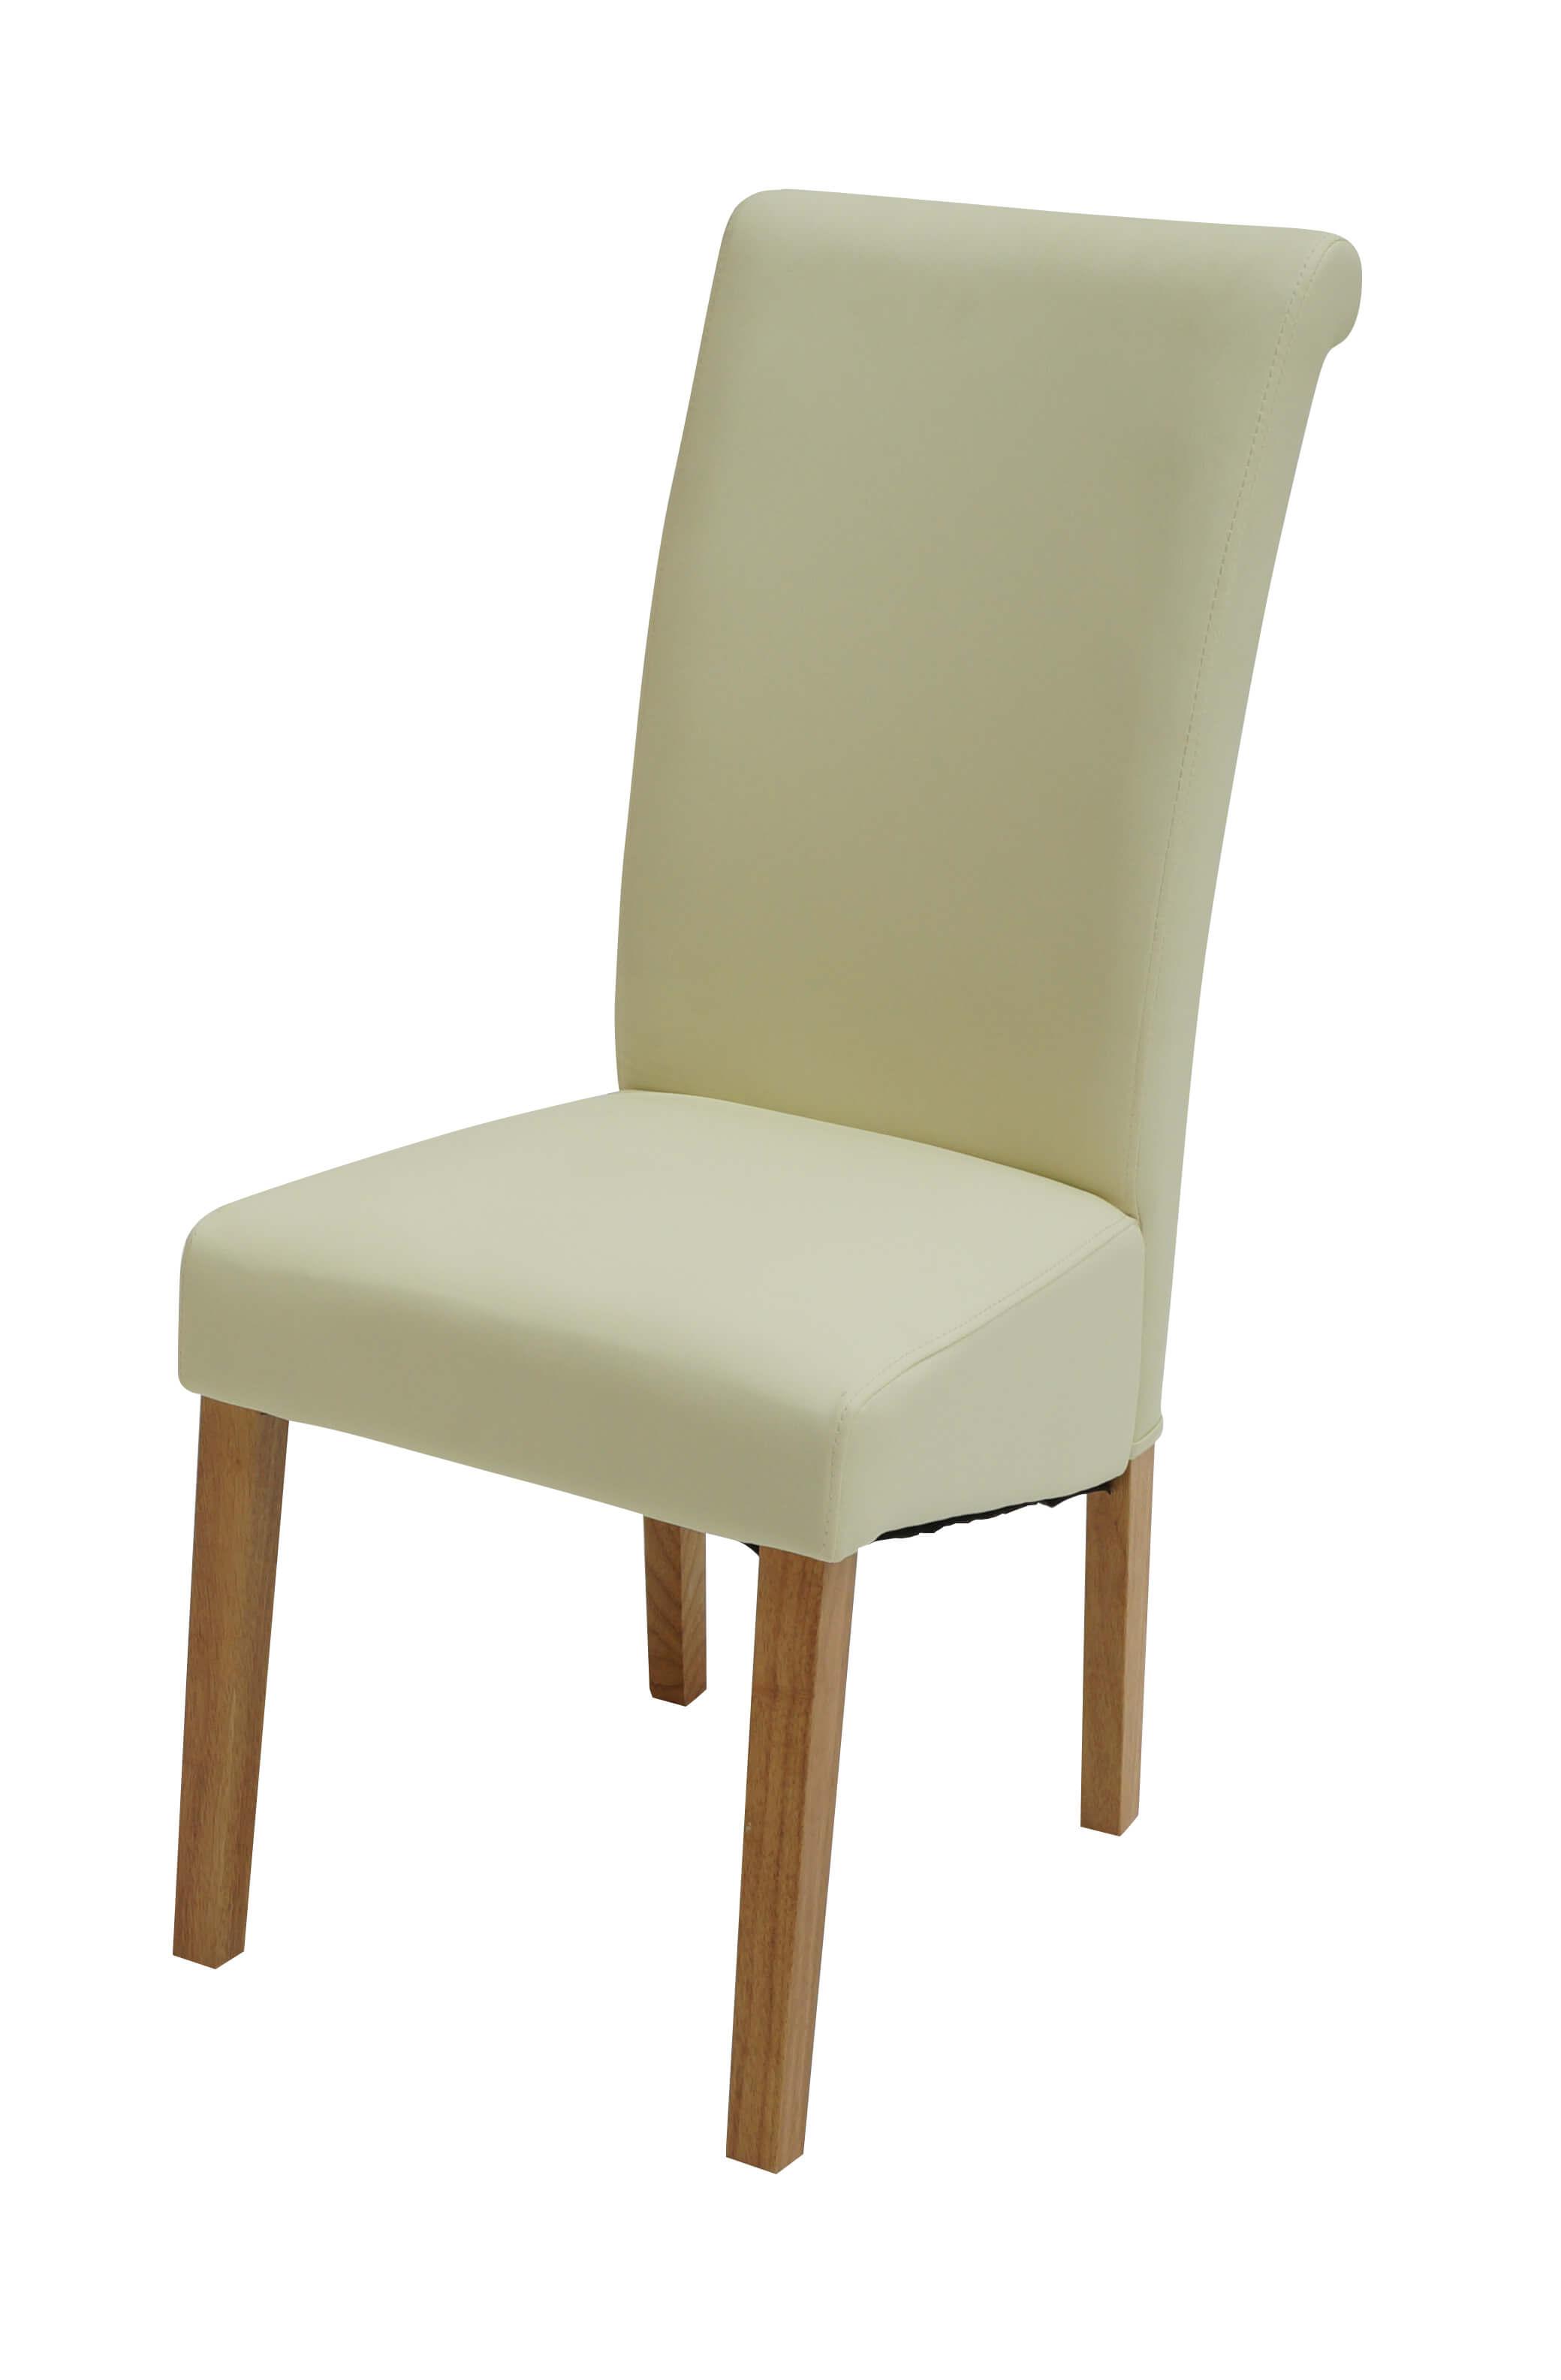 Sydney Oak Leg Cream Chair